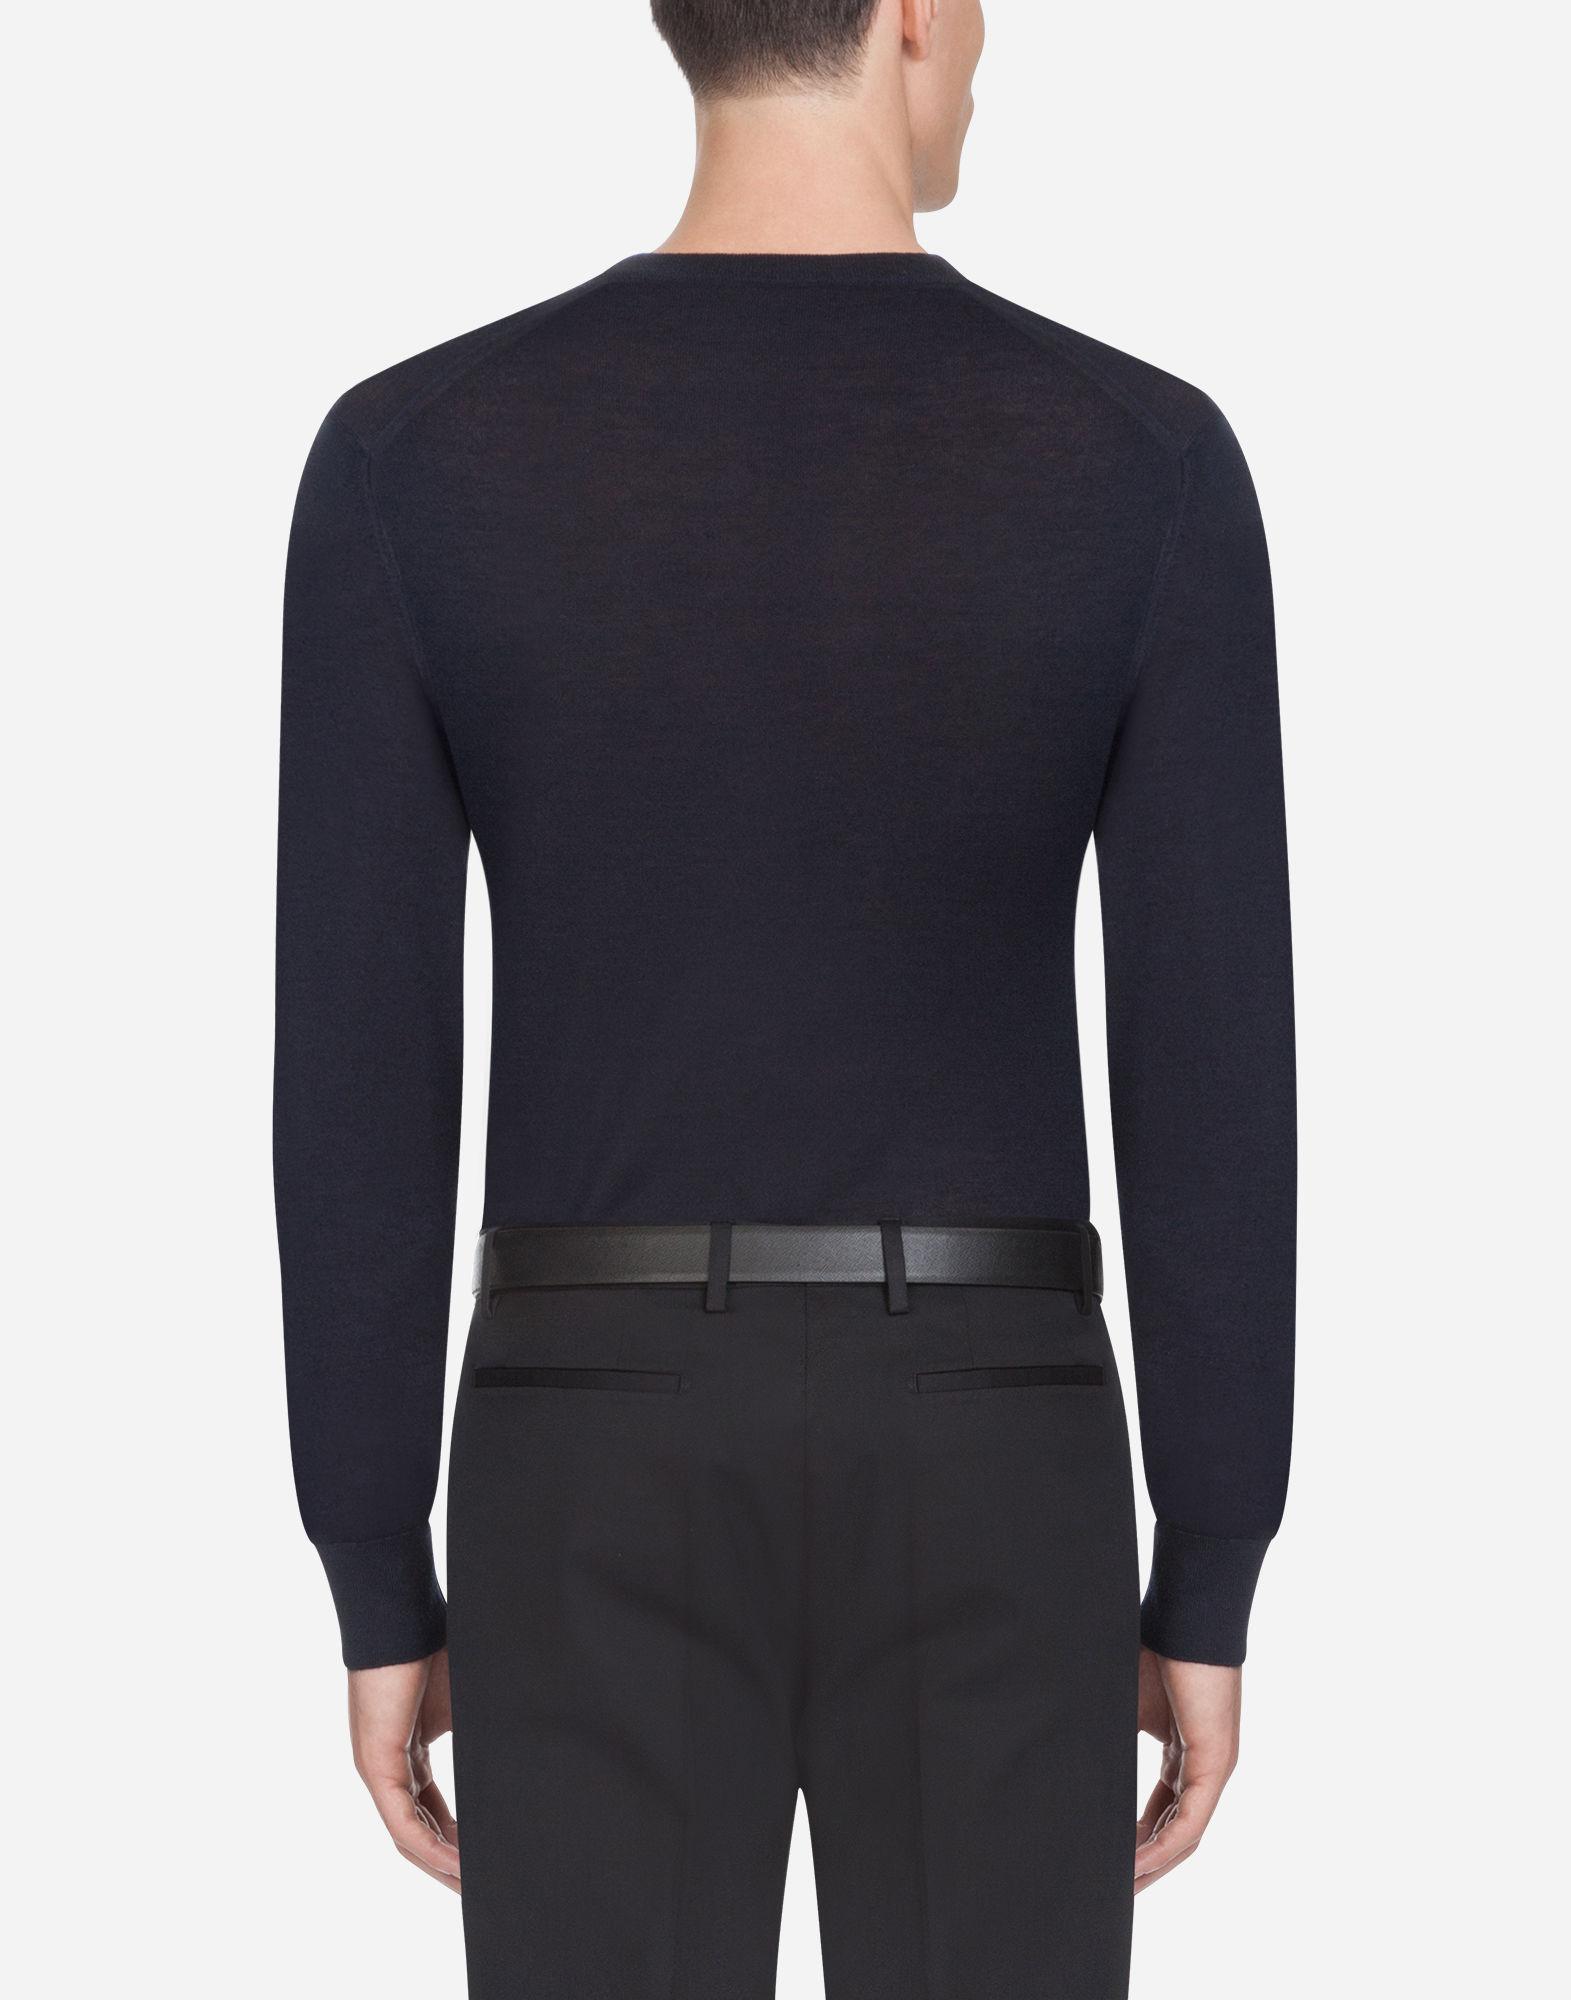 fc3028b0 Lyst - Dolce & Gabbana Crewneck Sweater In Cashmere in Blue for Men